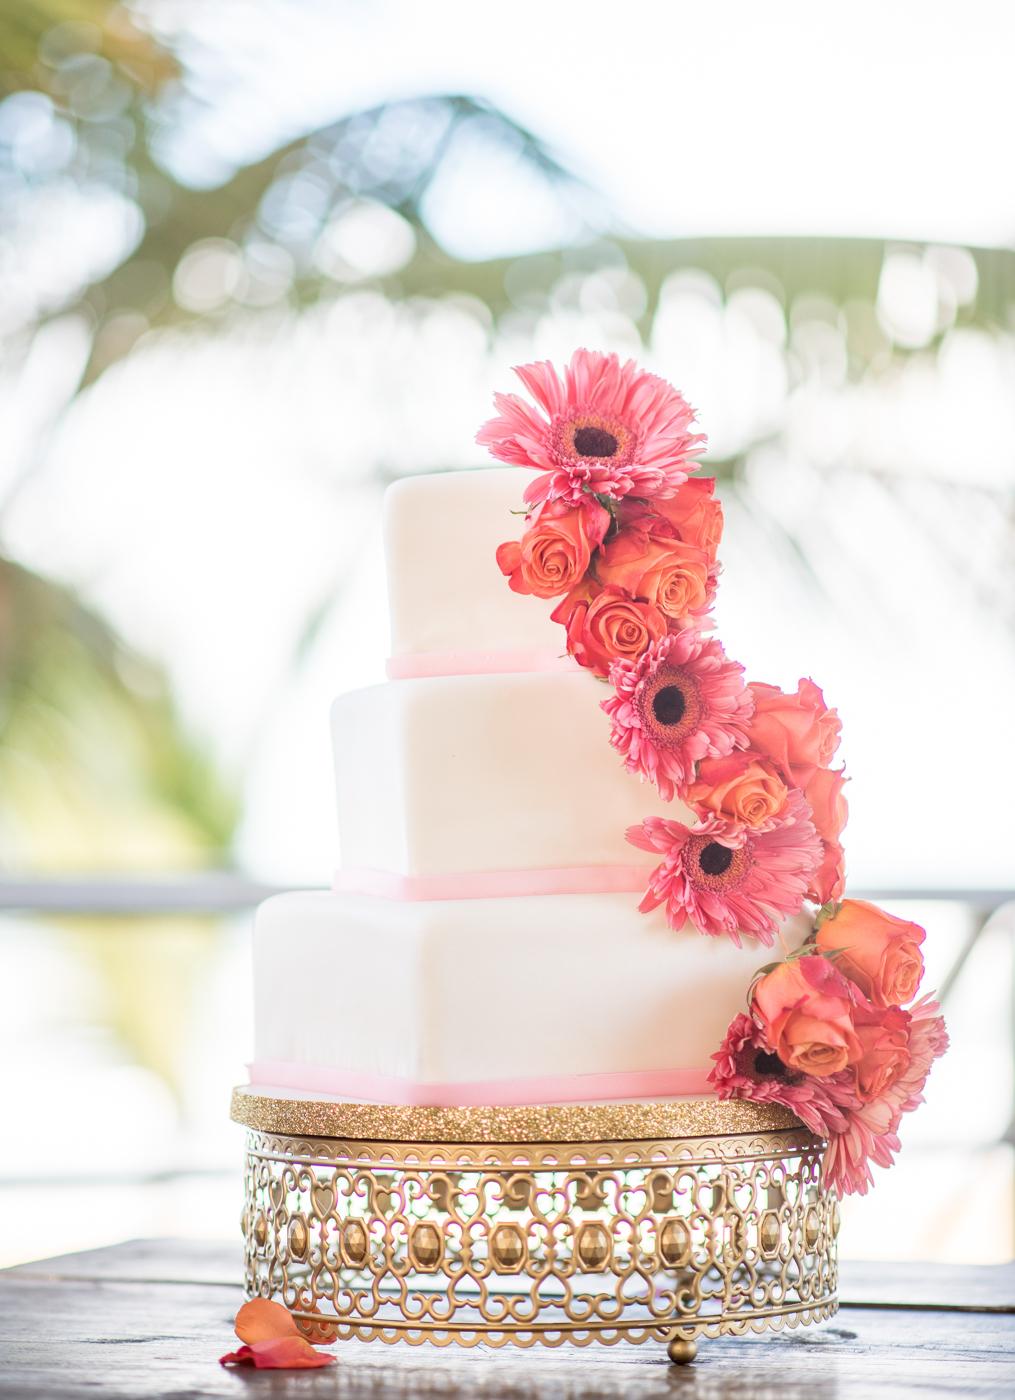 Yifan_Zhang_Geoff_Oberhofer_Carlin_Ma_wedding--19.jpg